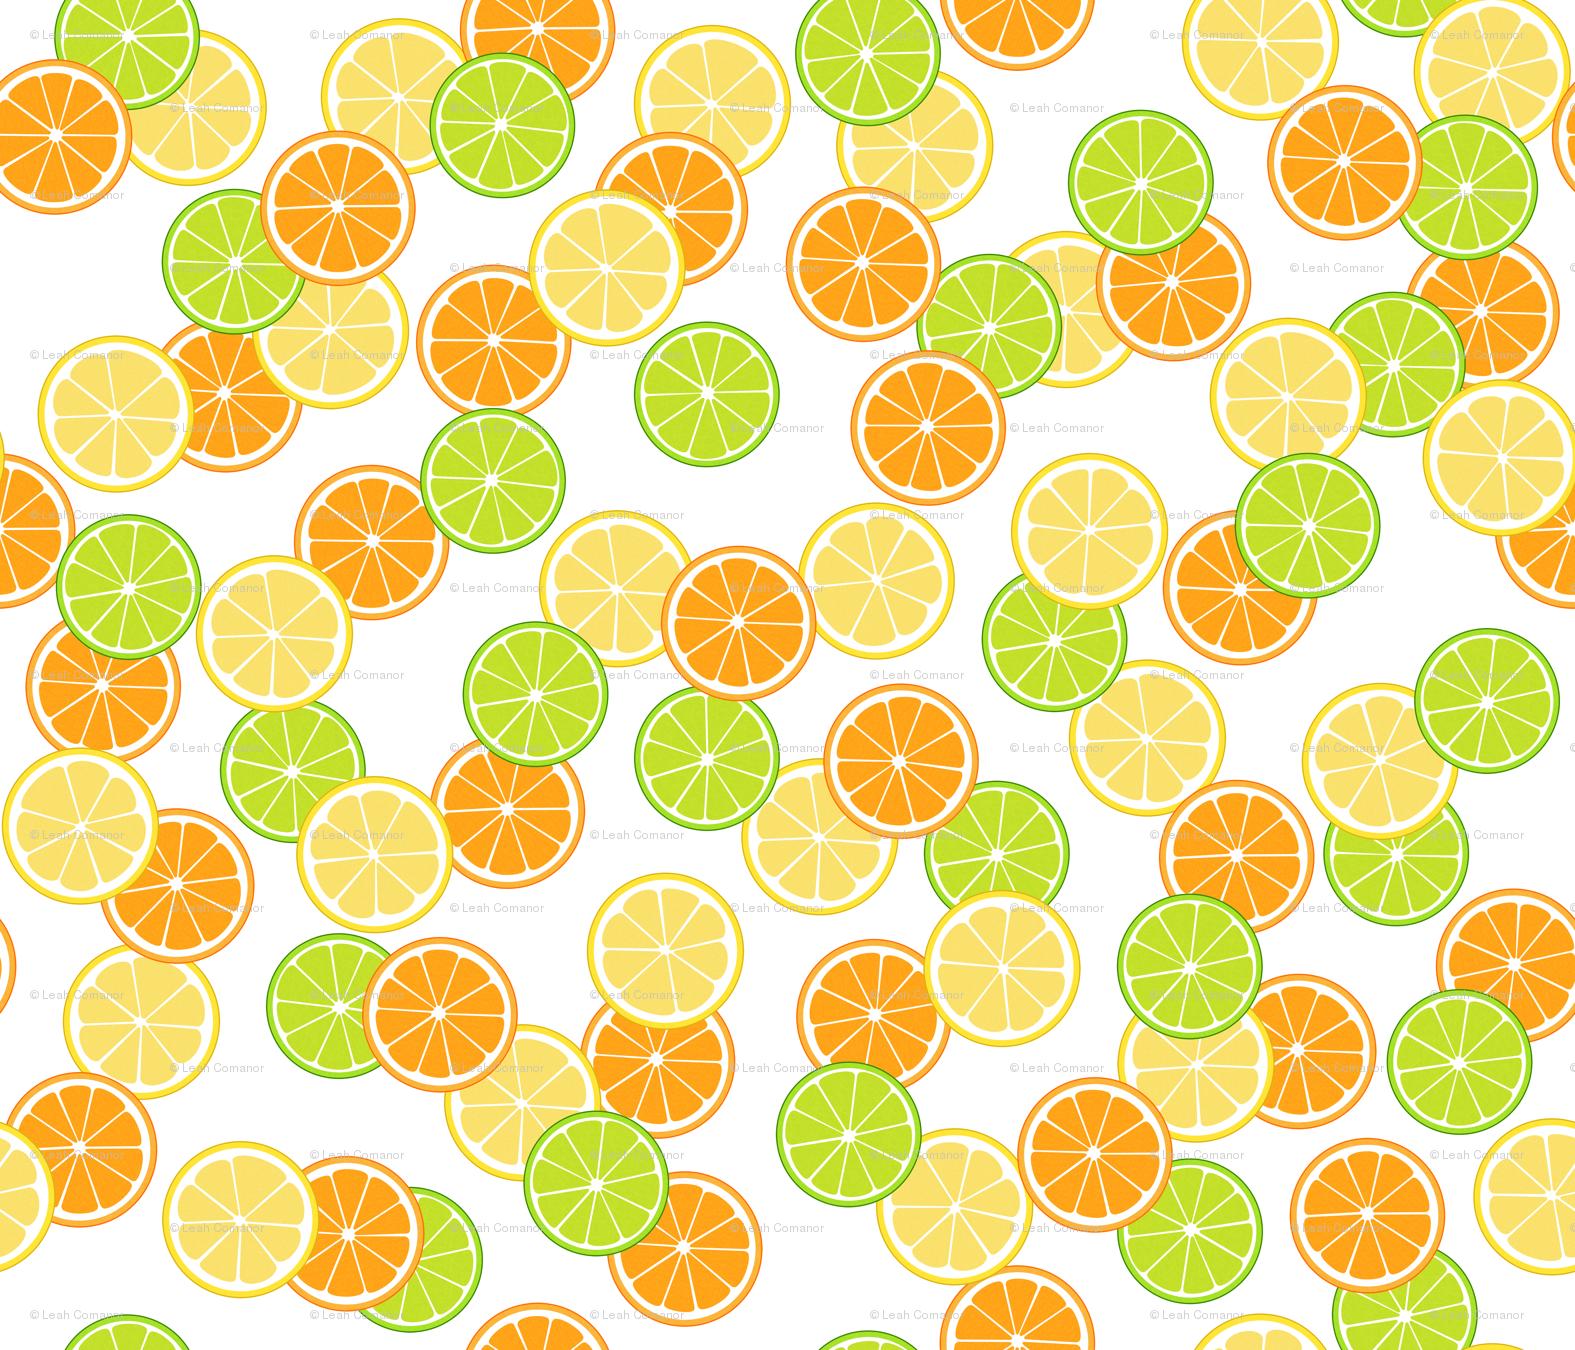 Free Download Lemon Pattern Wallpaper Rcitrus Swatch Contest